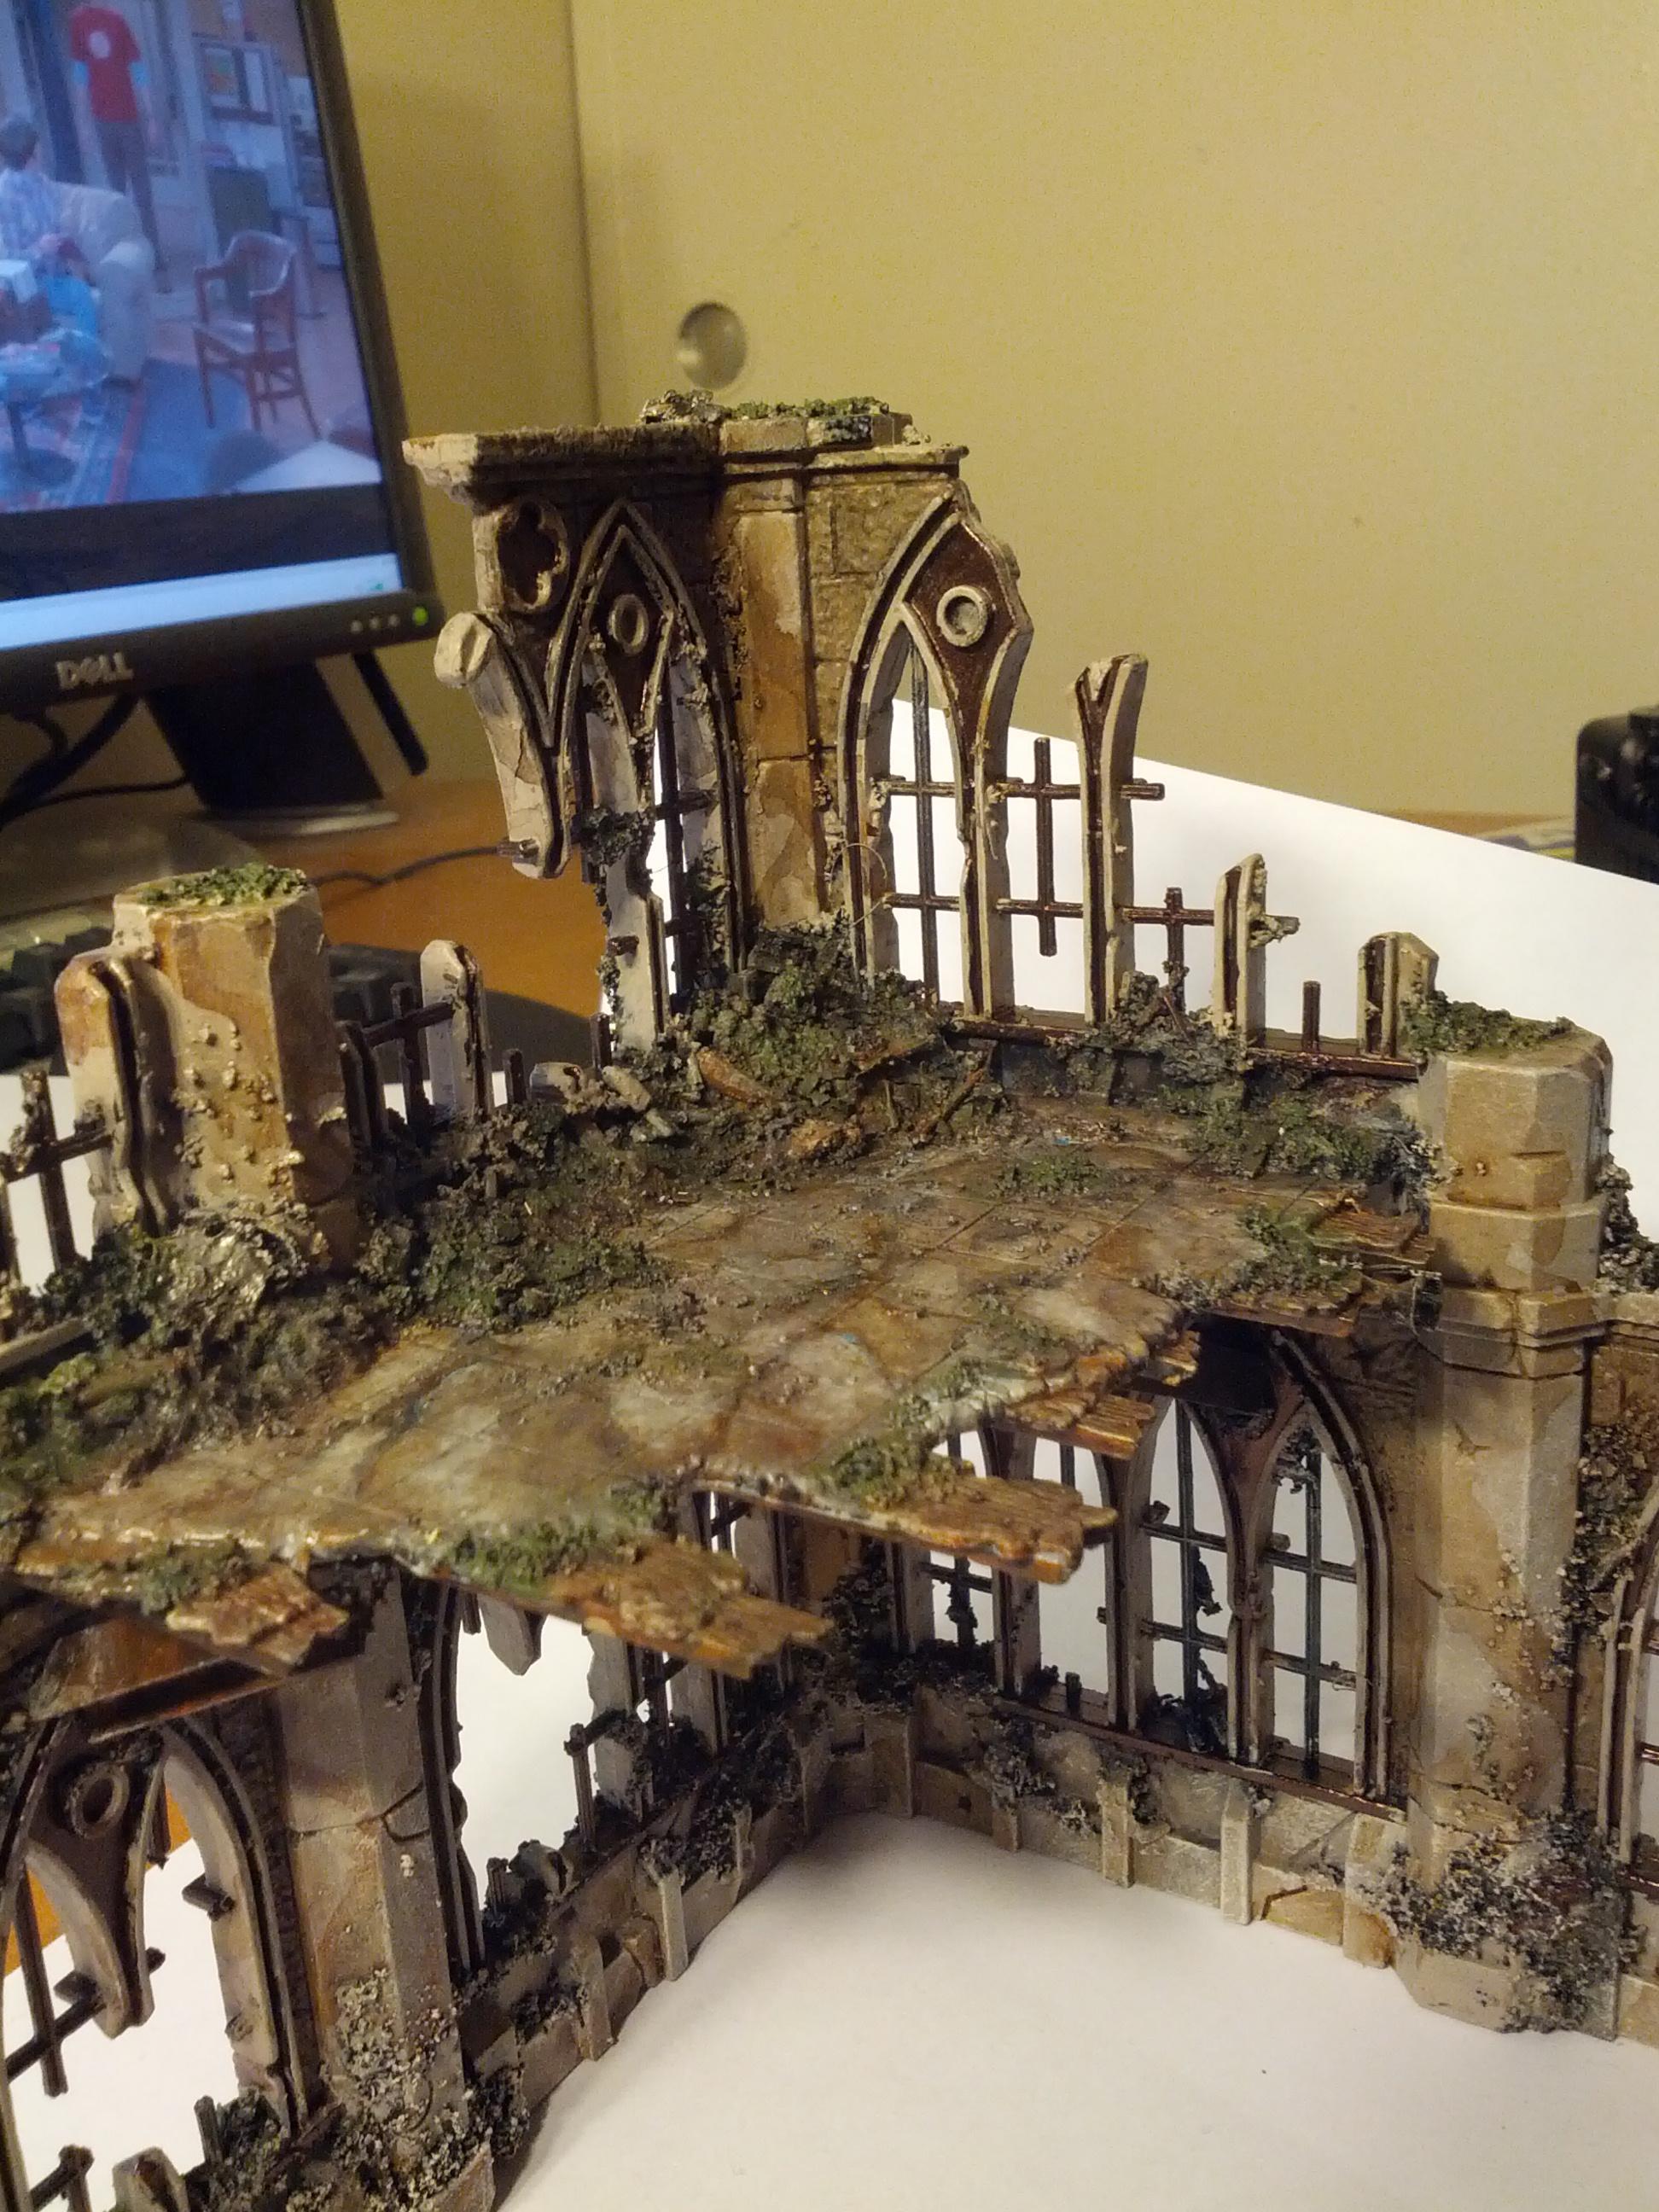 Imperial, Ruins, Warhammer 40,000